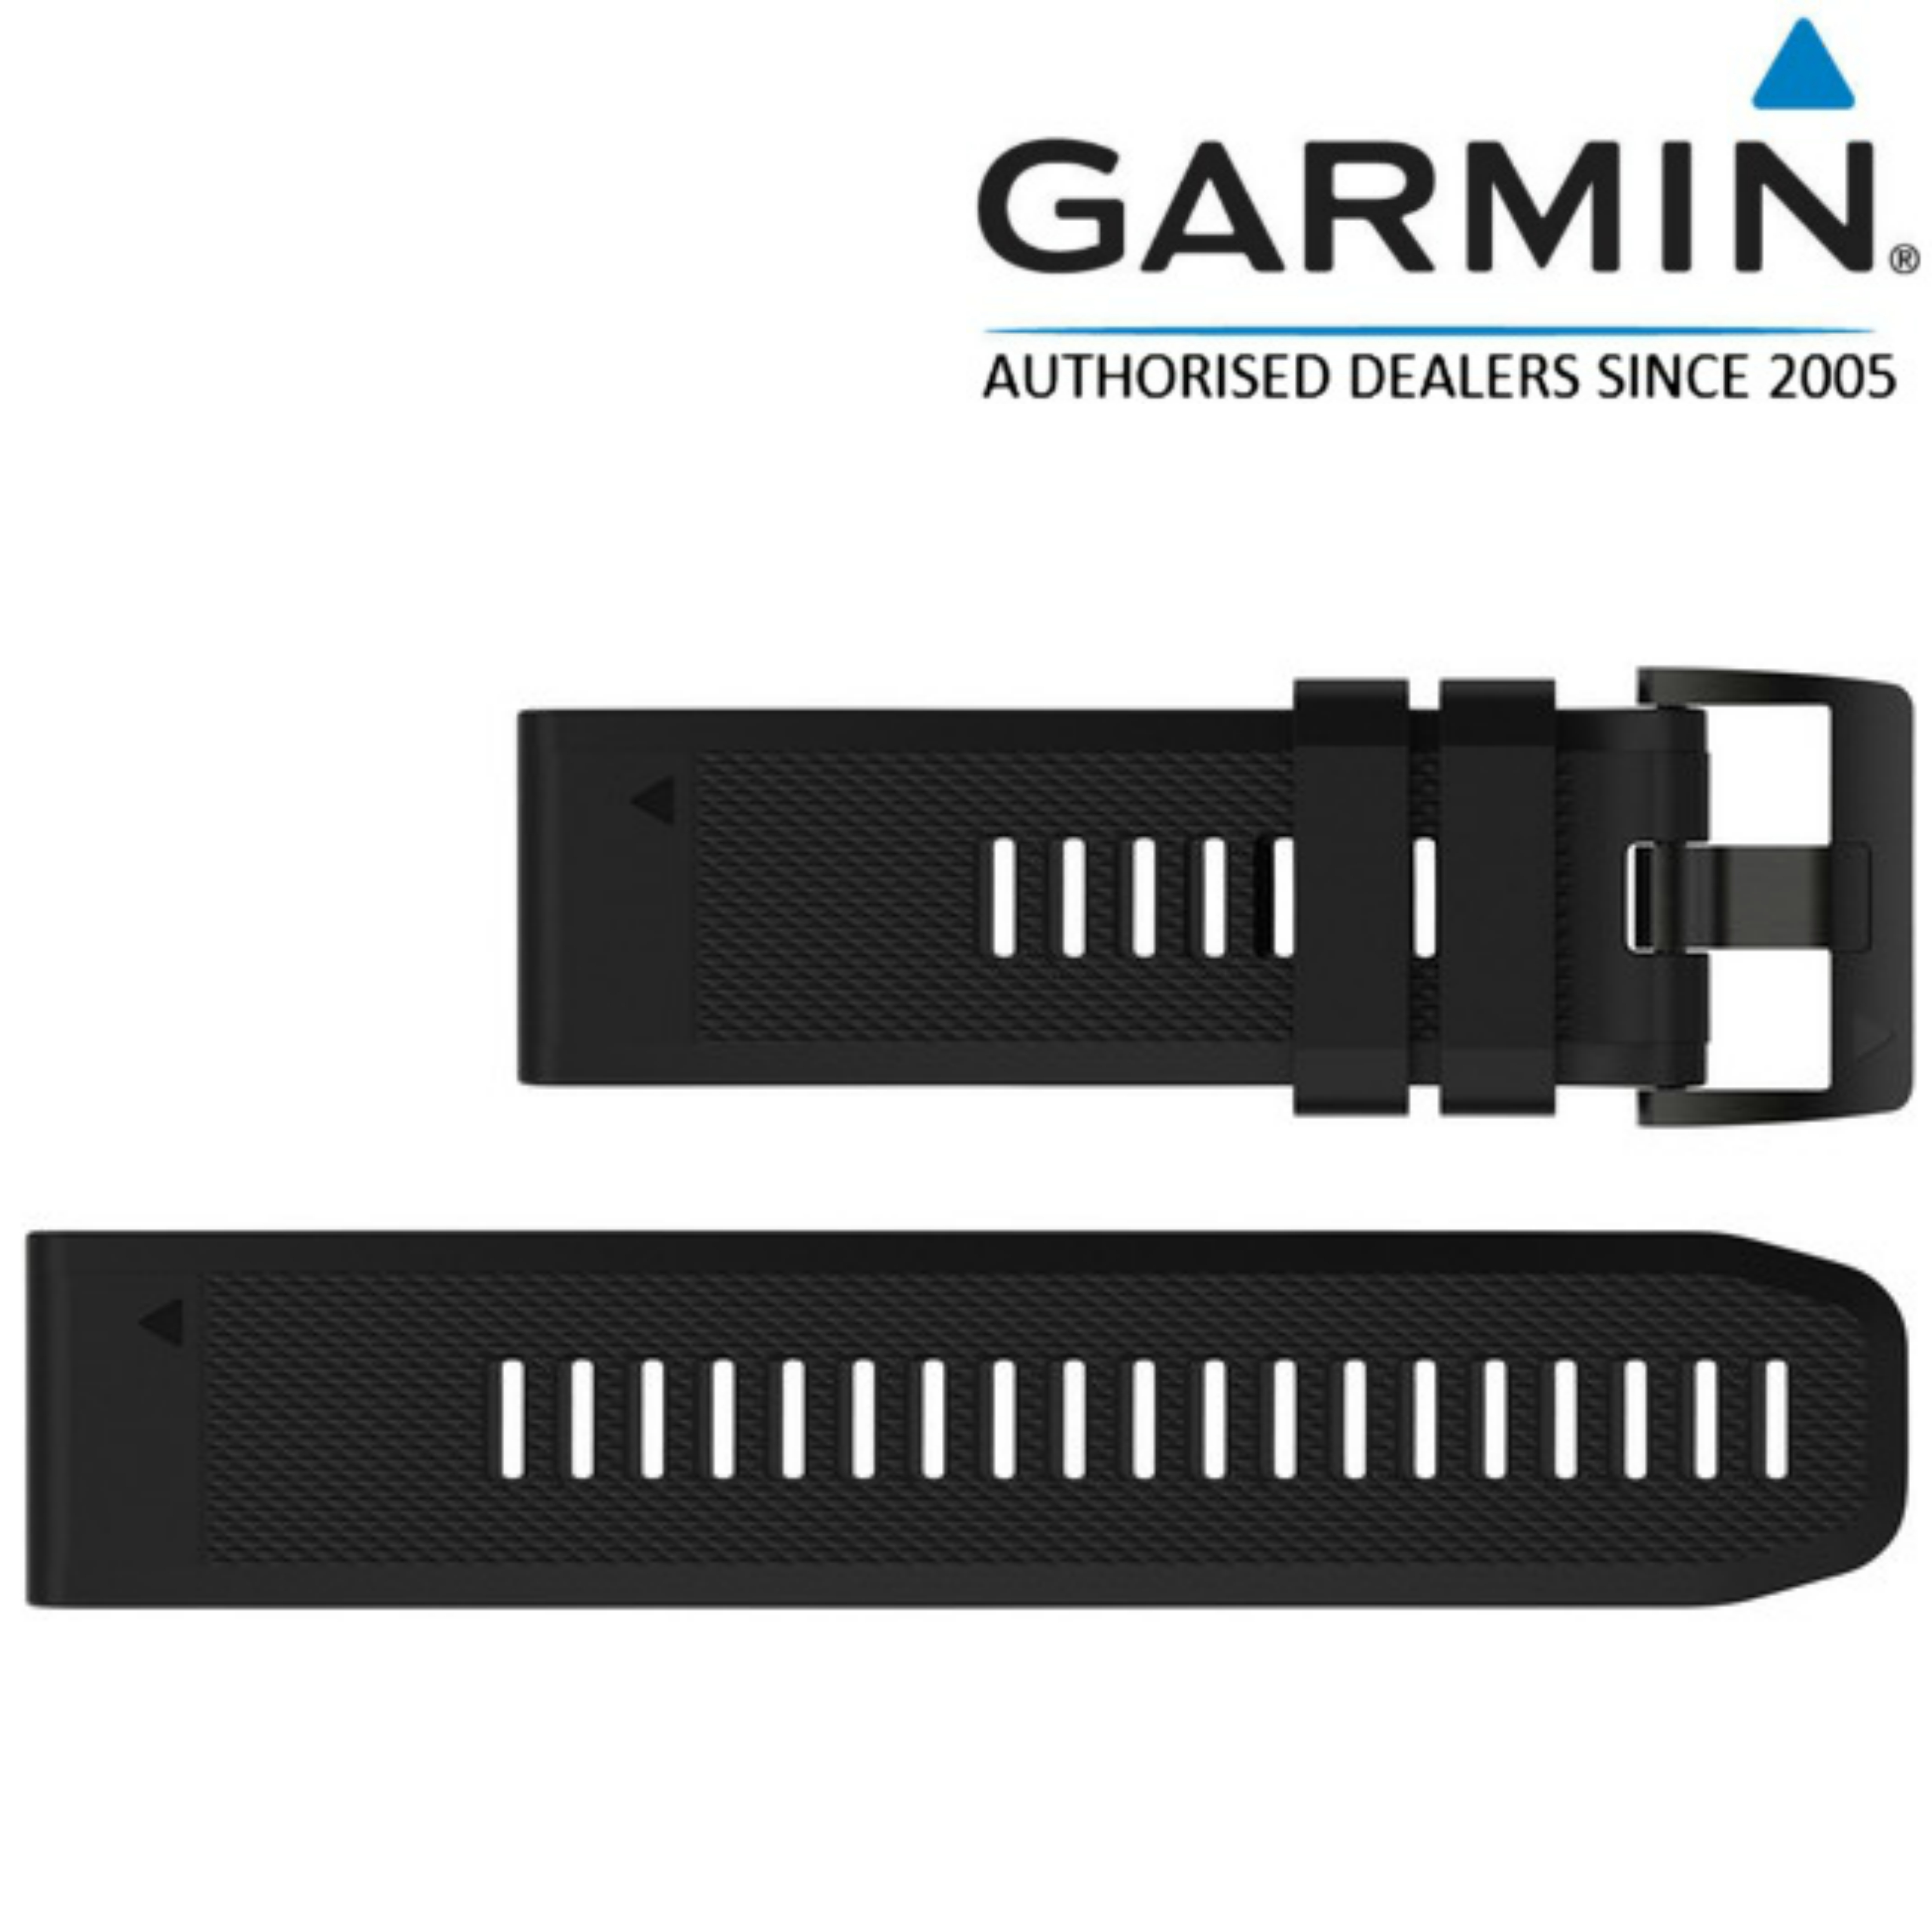 Garmin 010-12517-00 Quickfit 26mm Black Silicone Watch Band For Quatix 3/Fenix 3